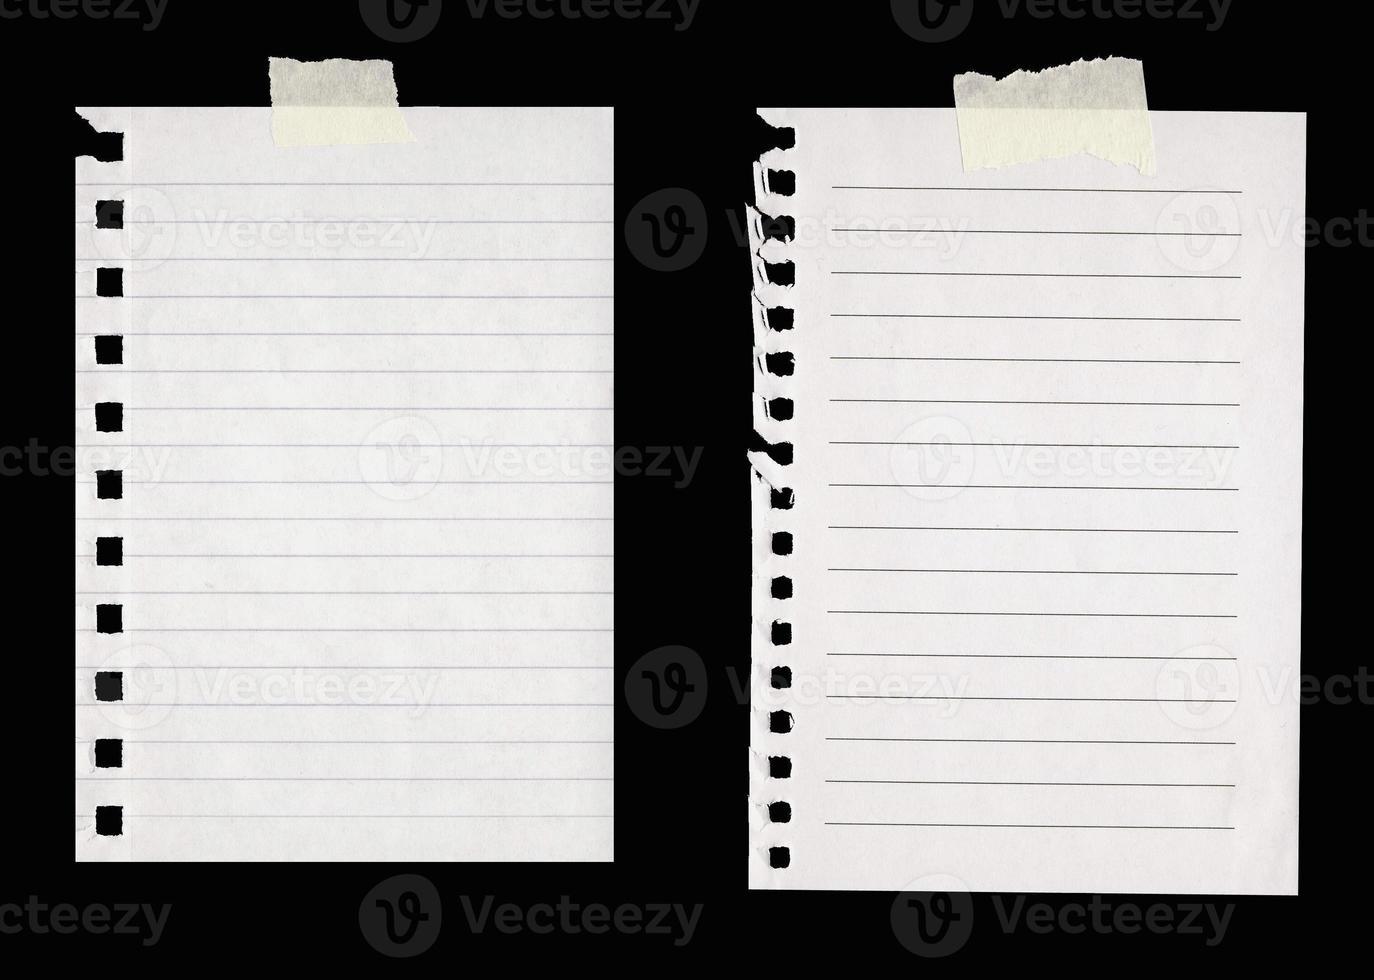 papel pautado com fita adesiva foto